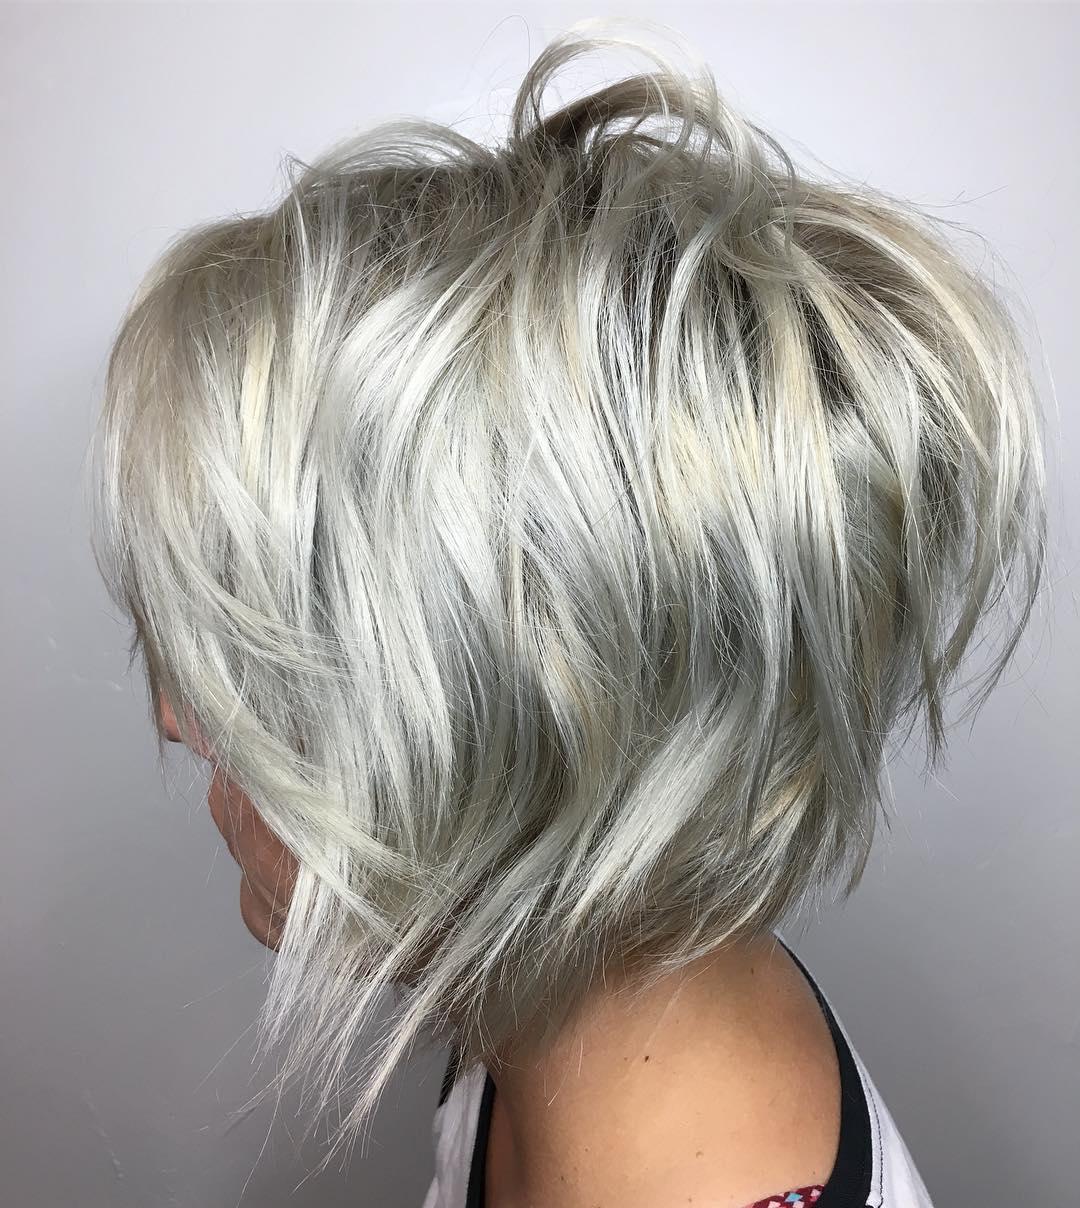 Inverted Layered Silver Shaggy Bob